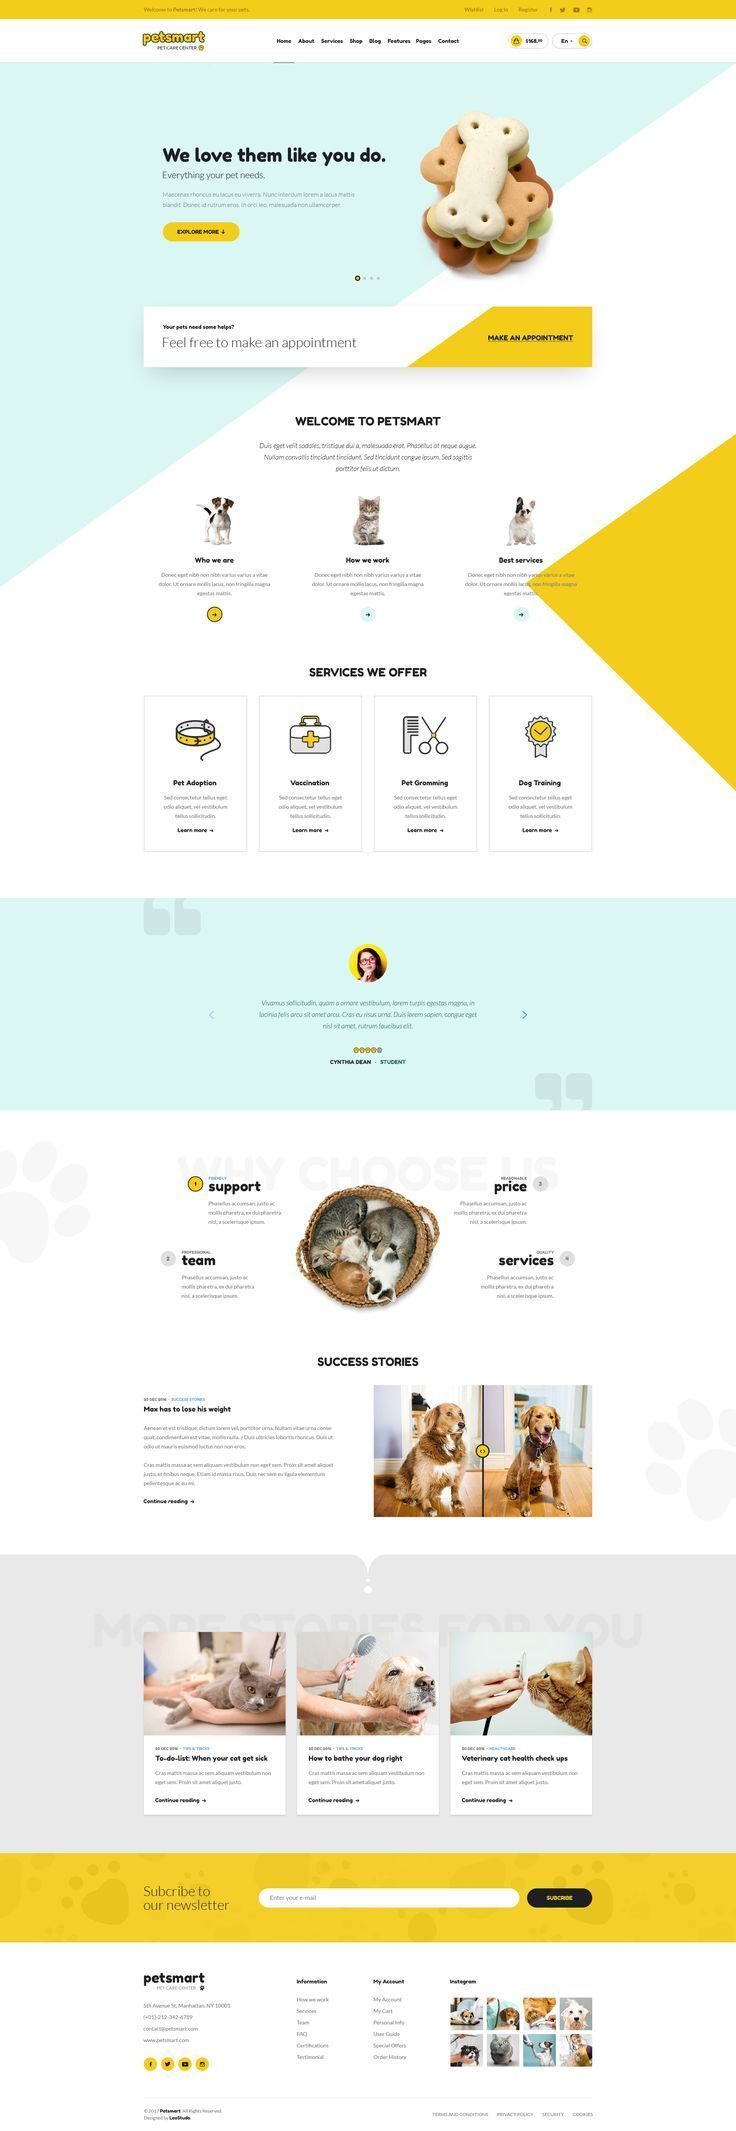 Pet Care Shop Hotel Petsmart Petsmart Psd Psd Template Download Web Design Tips Web Development Design Website Design Layout